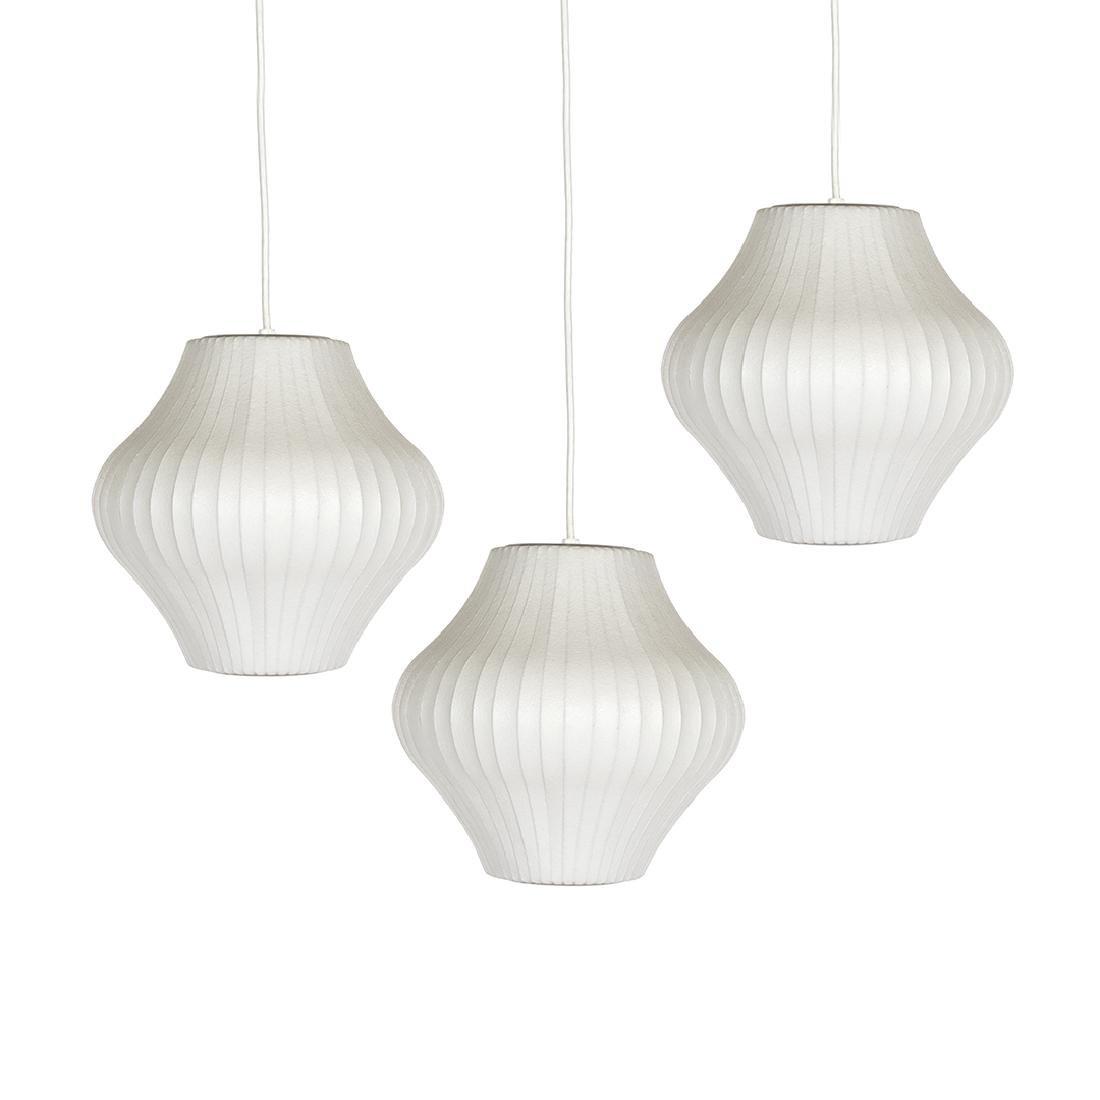 George Nelson Bubble Lamps (3)